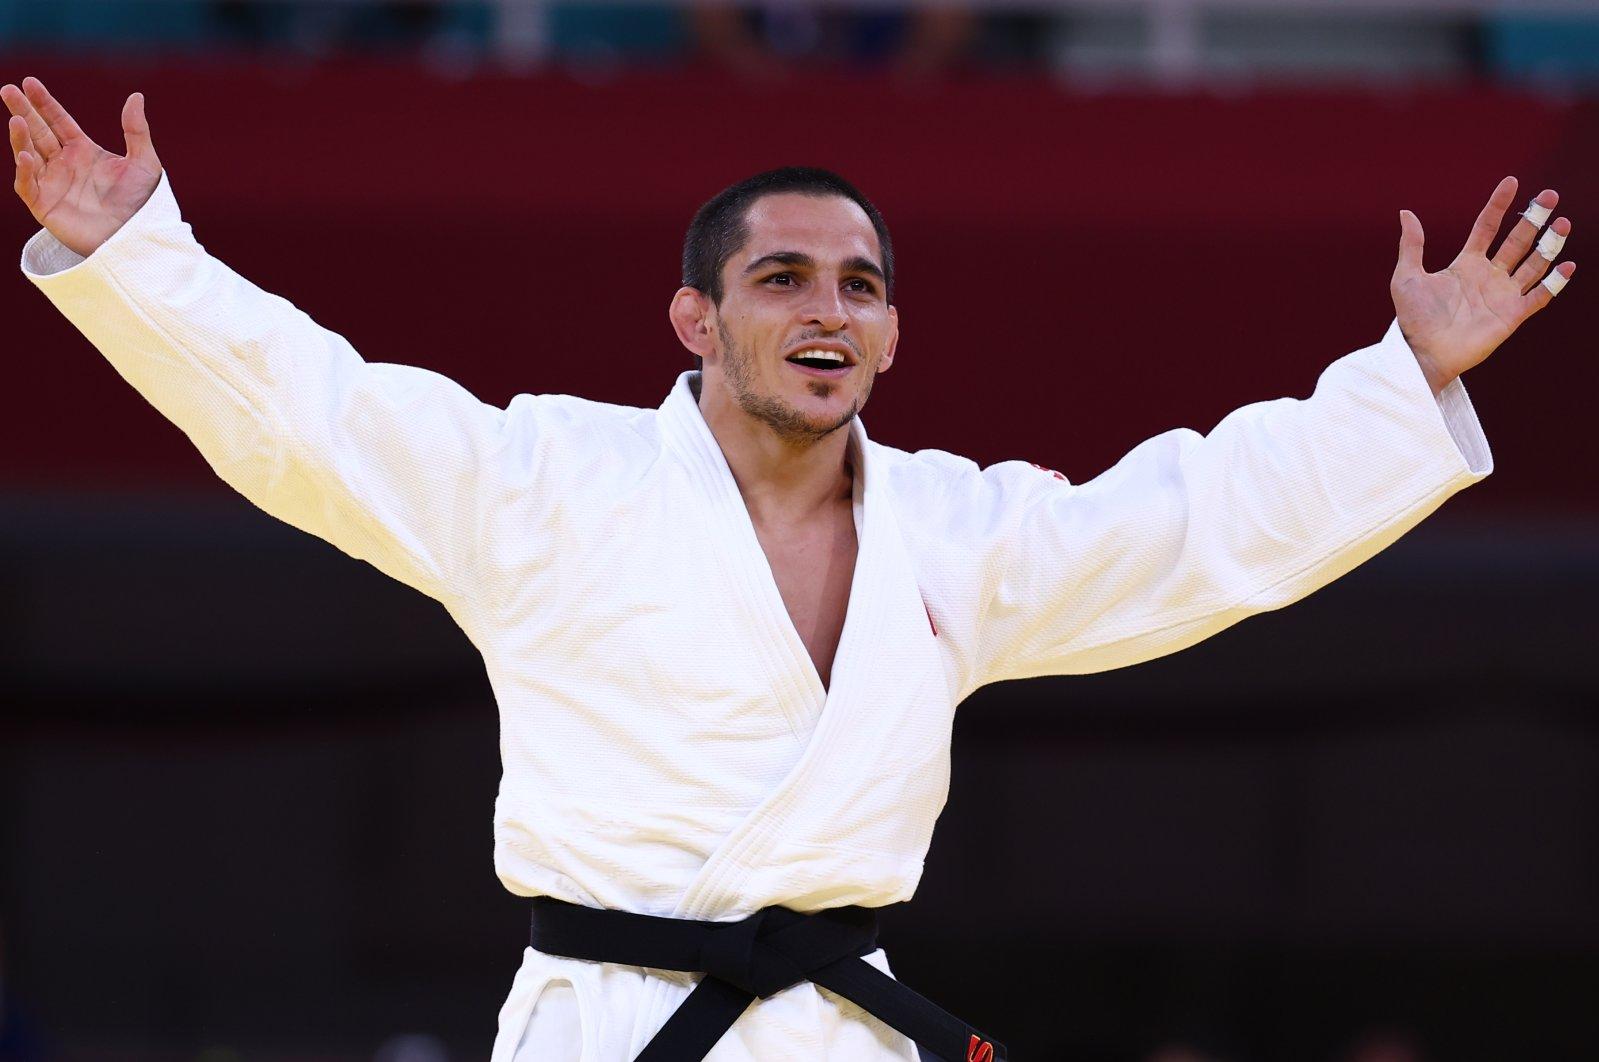 Turkish judoka Recep Çifçi celebrates after winning his match against Venezuela's Marcos Dennis Blanco at the Tokyo 2020 Paralympics, in Tokyo, Japan, Aug. 27, 2021. (Reuters Photo)